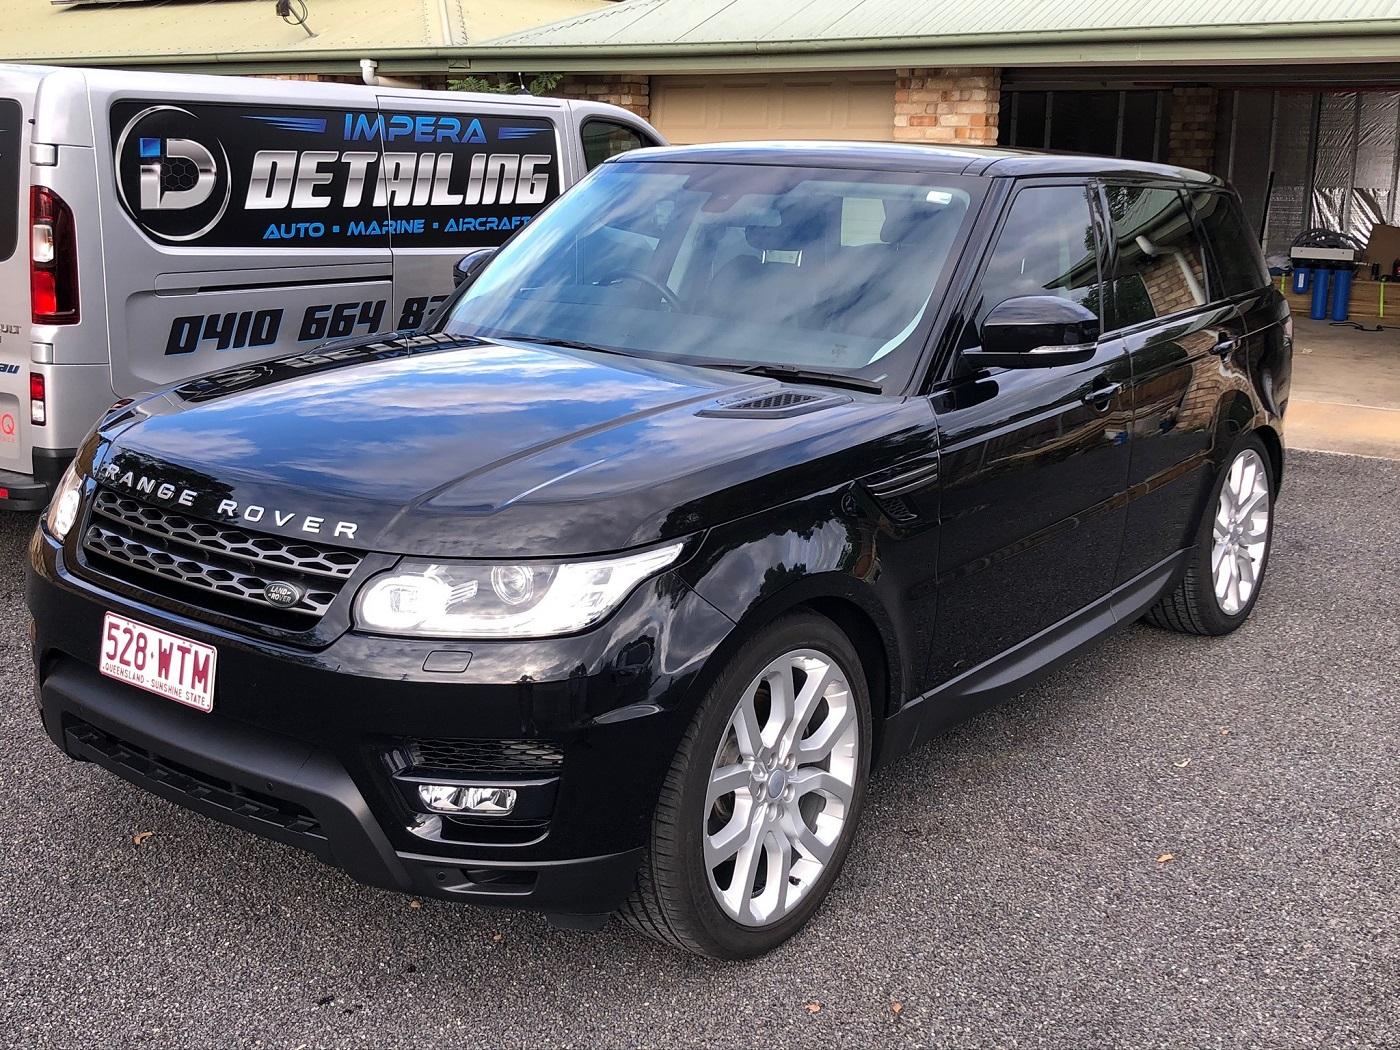 Range Rover exterior car detail Brisbane.jpg